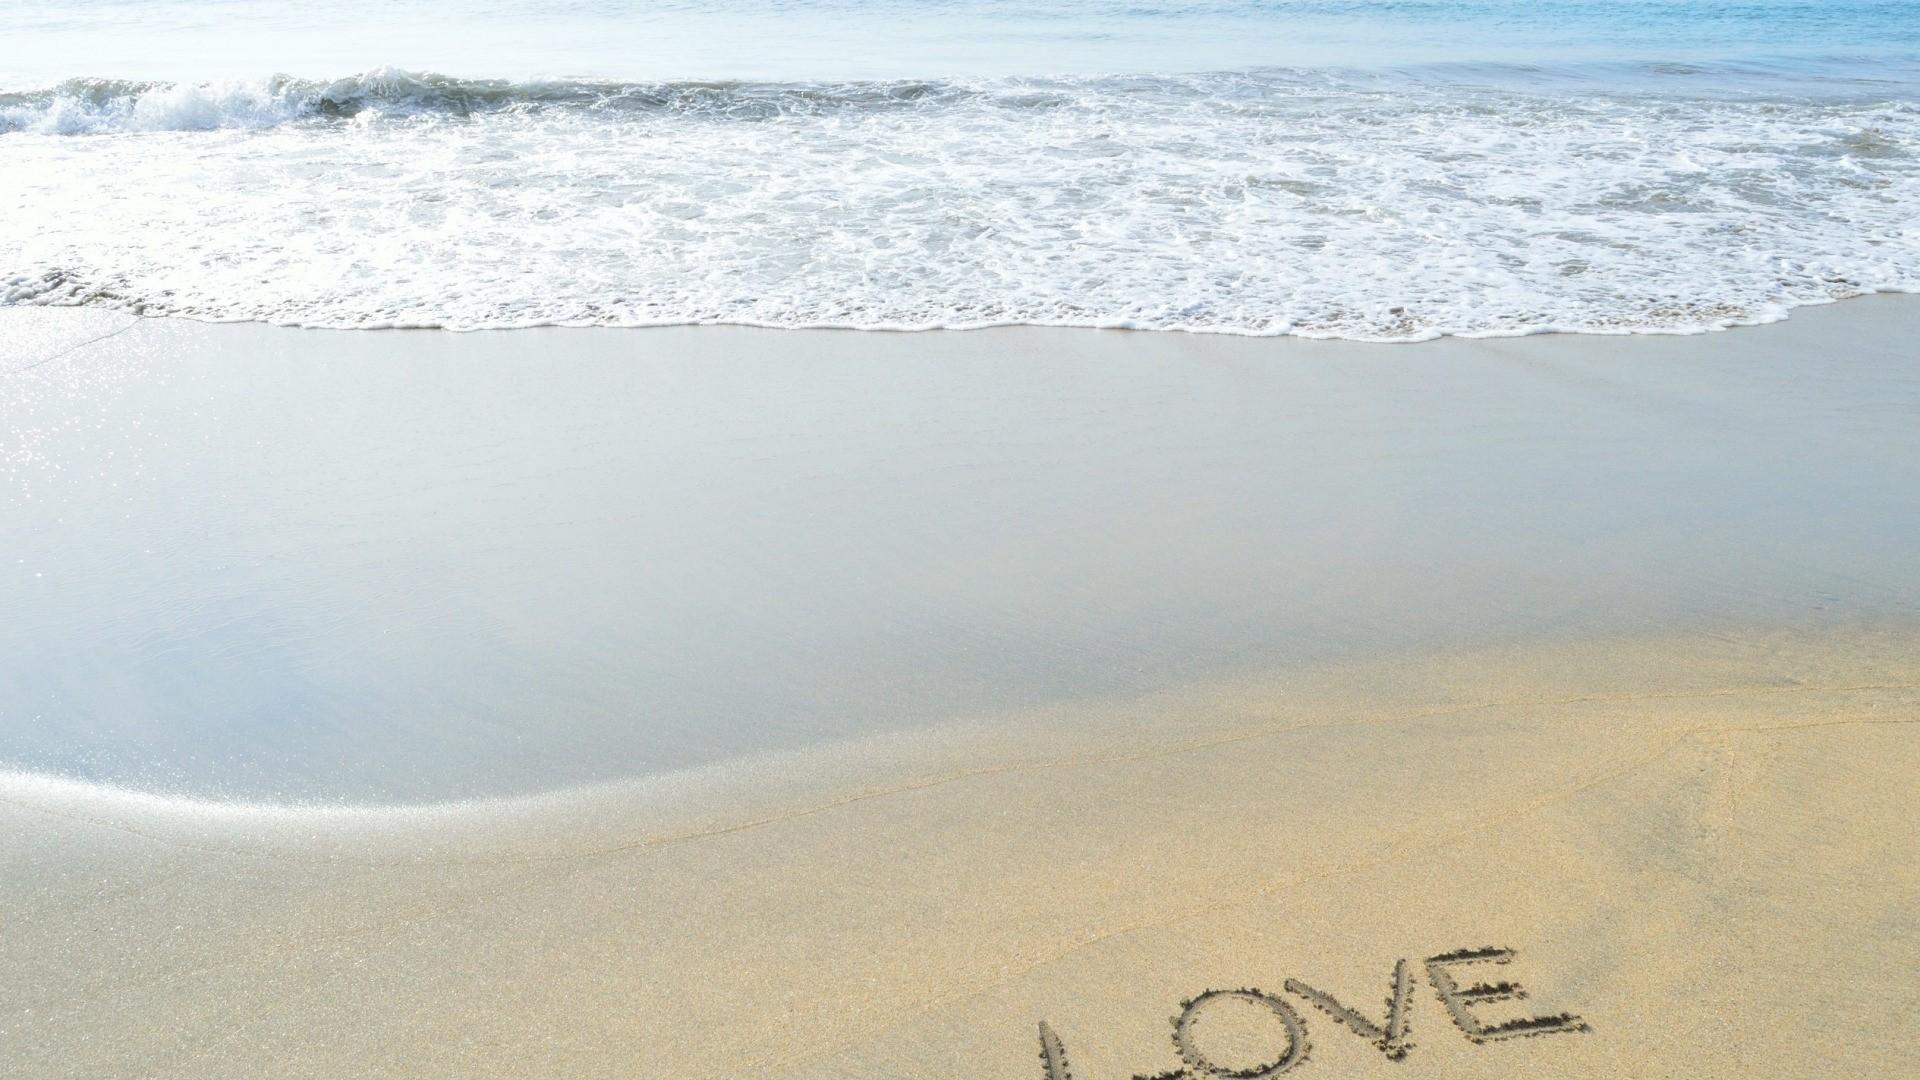 Sand Love wallpaper photo hd